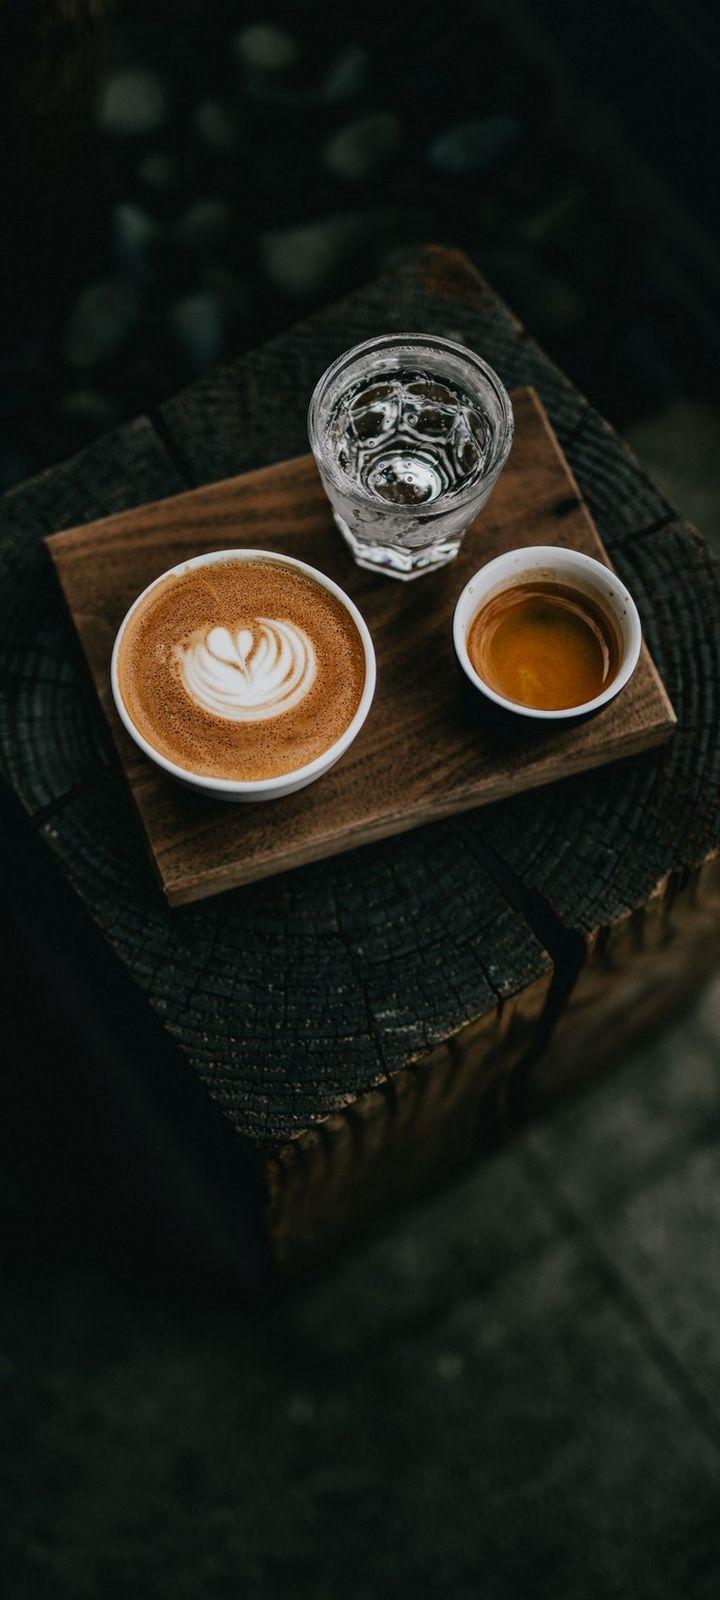 Coffee Water Cups Drinks Wallpaper 720x1600